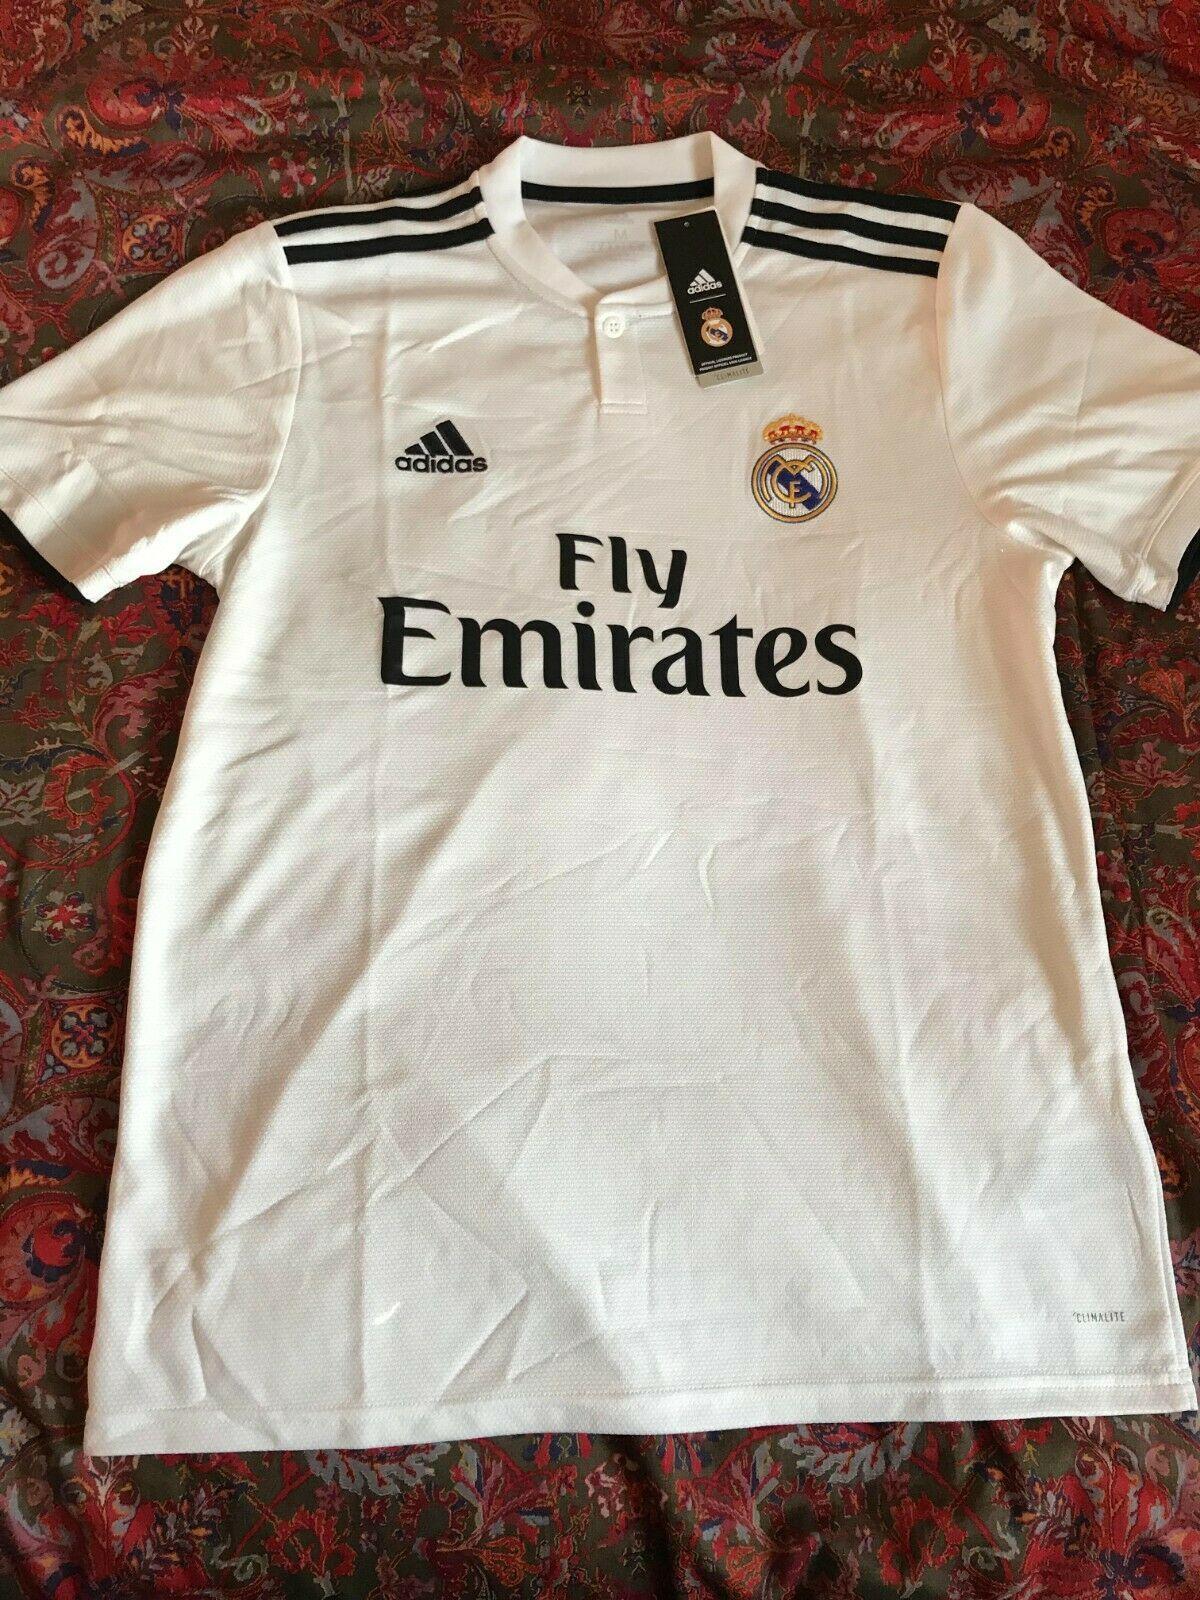 8ce5c358a Adidas Men s 2018 19 Real Madrid Home Stadium Soccer Jersey (White Black)